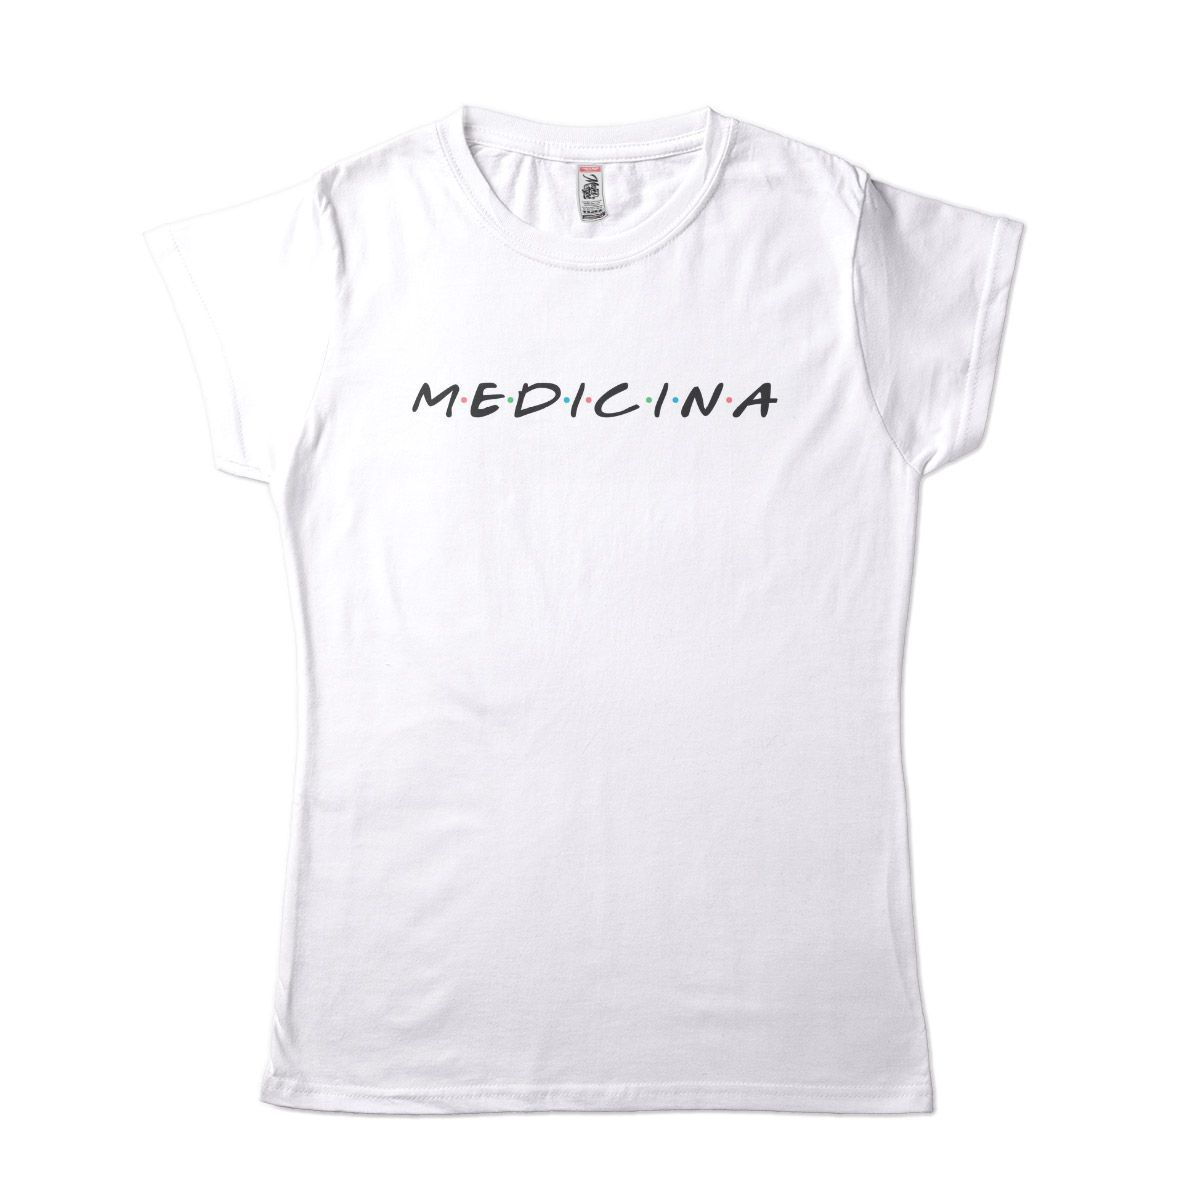 camiseta faculdade de medicina criativa estilo friends